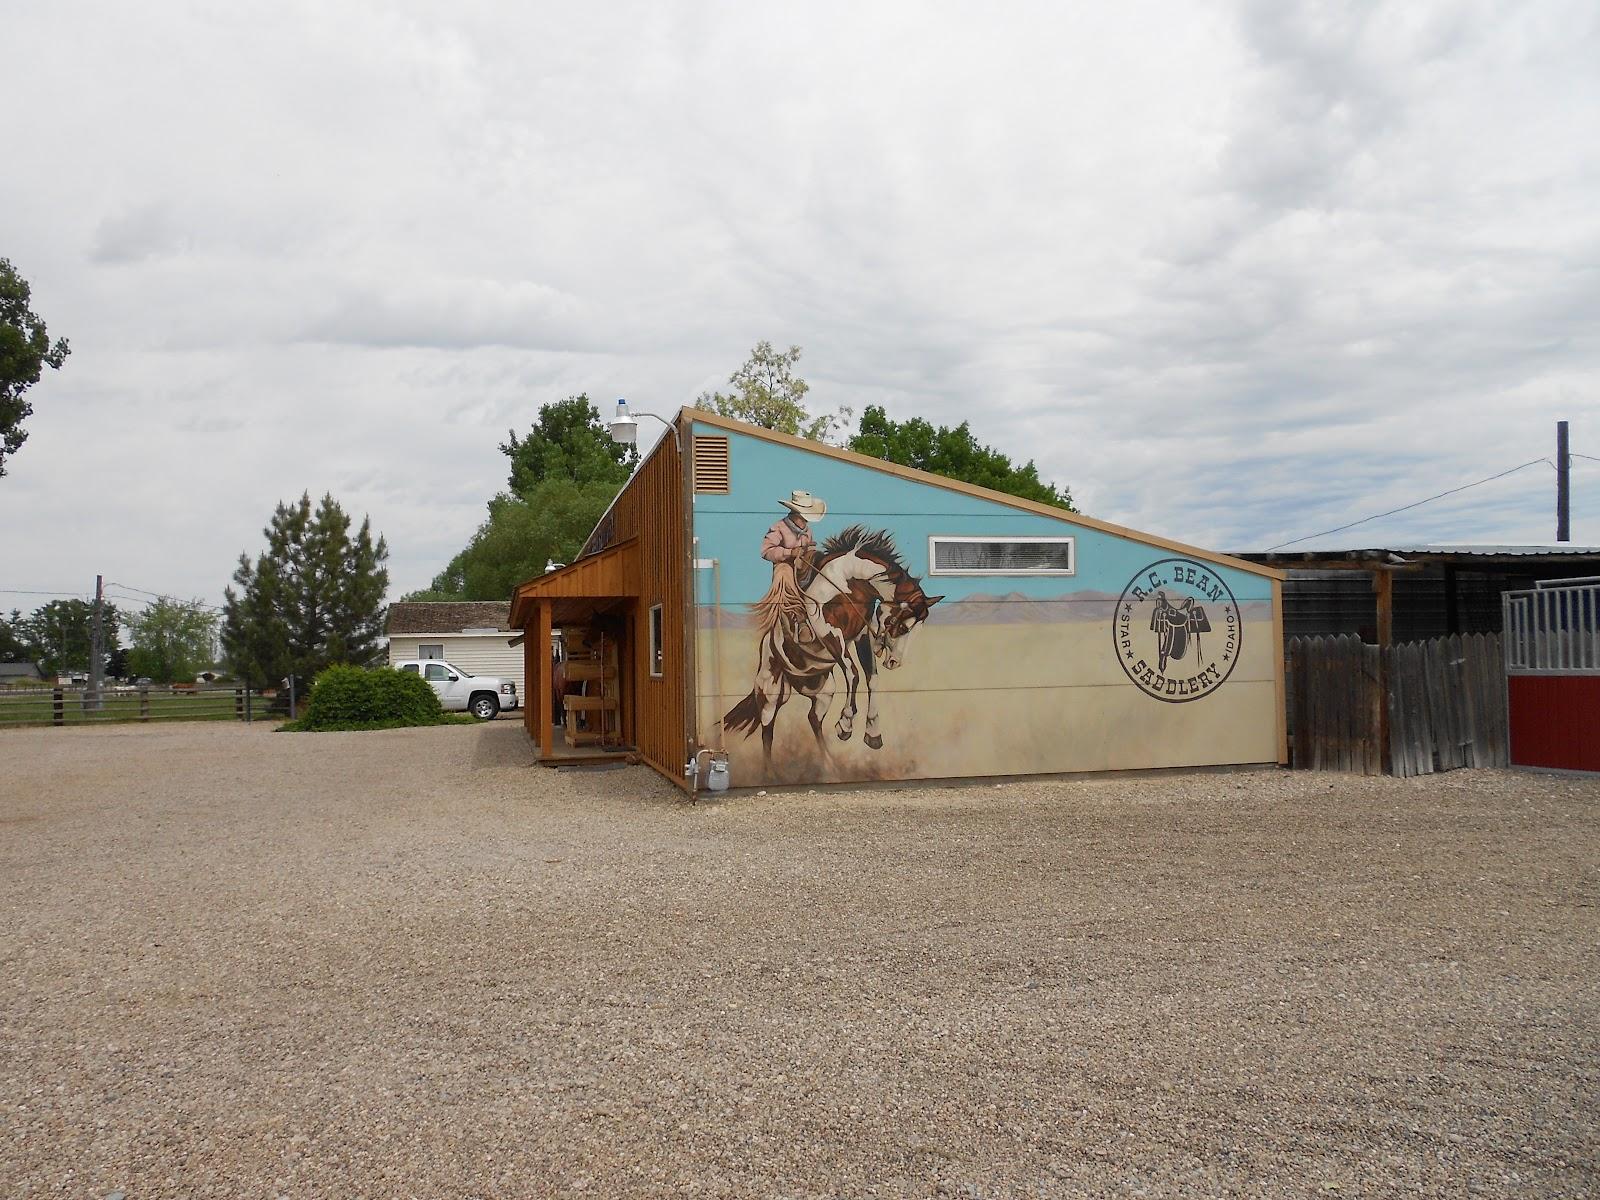 Rodeo Tales & Gypsy Trails: R C  Bean Saddlery